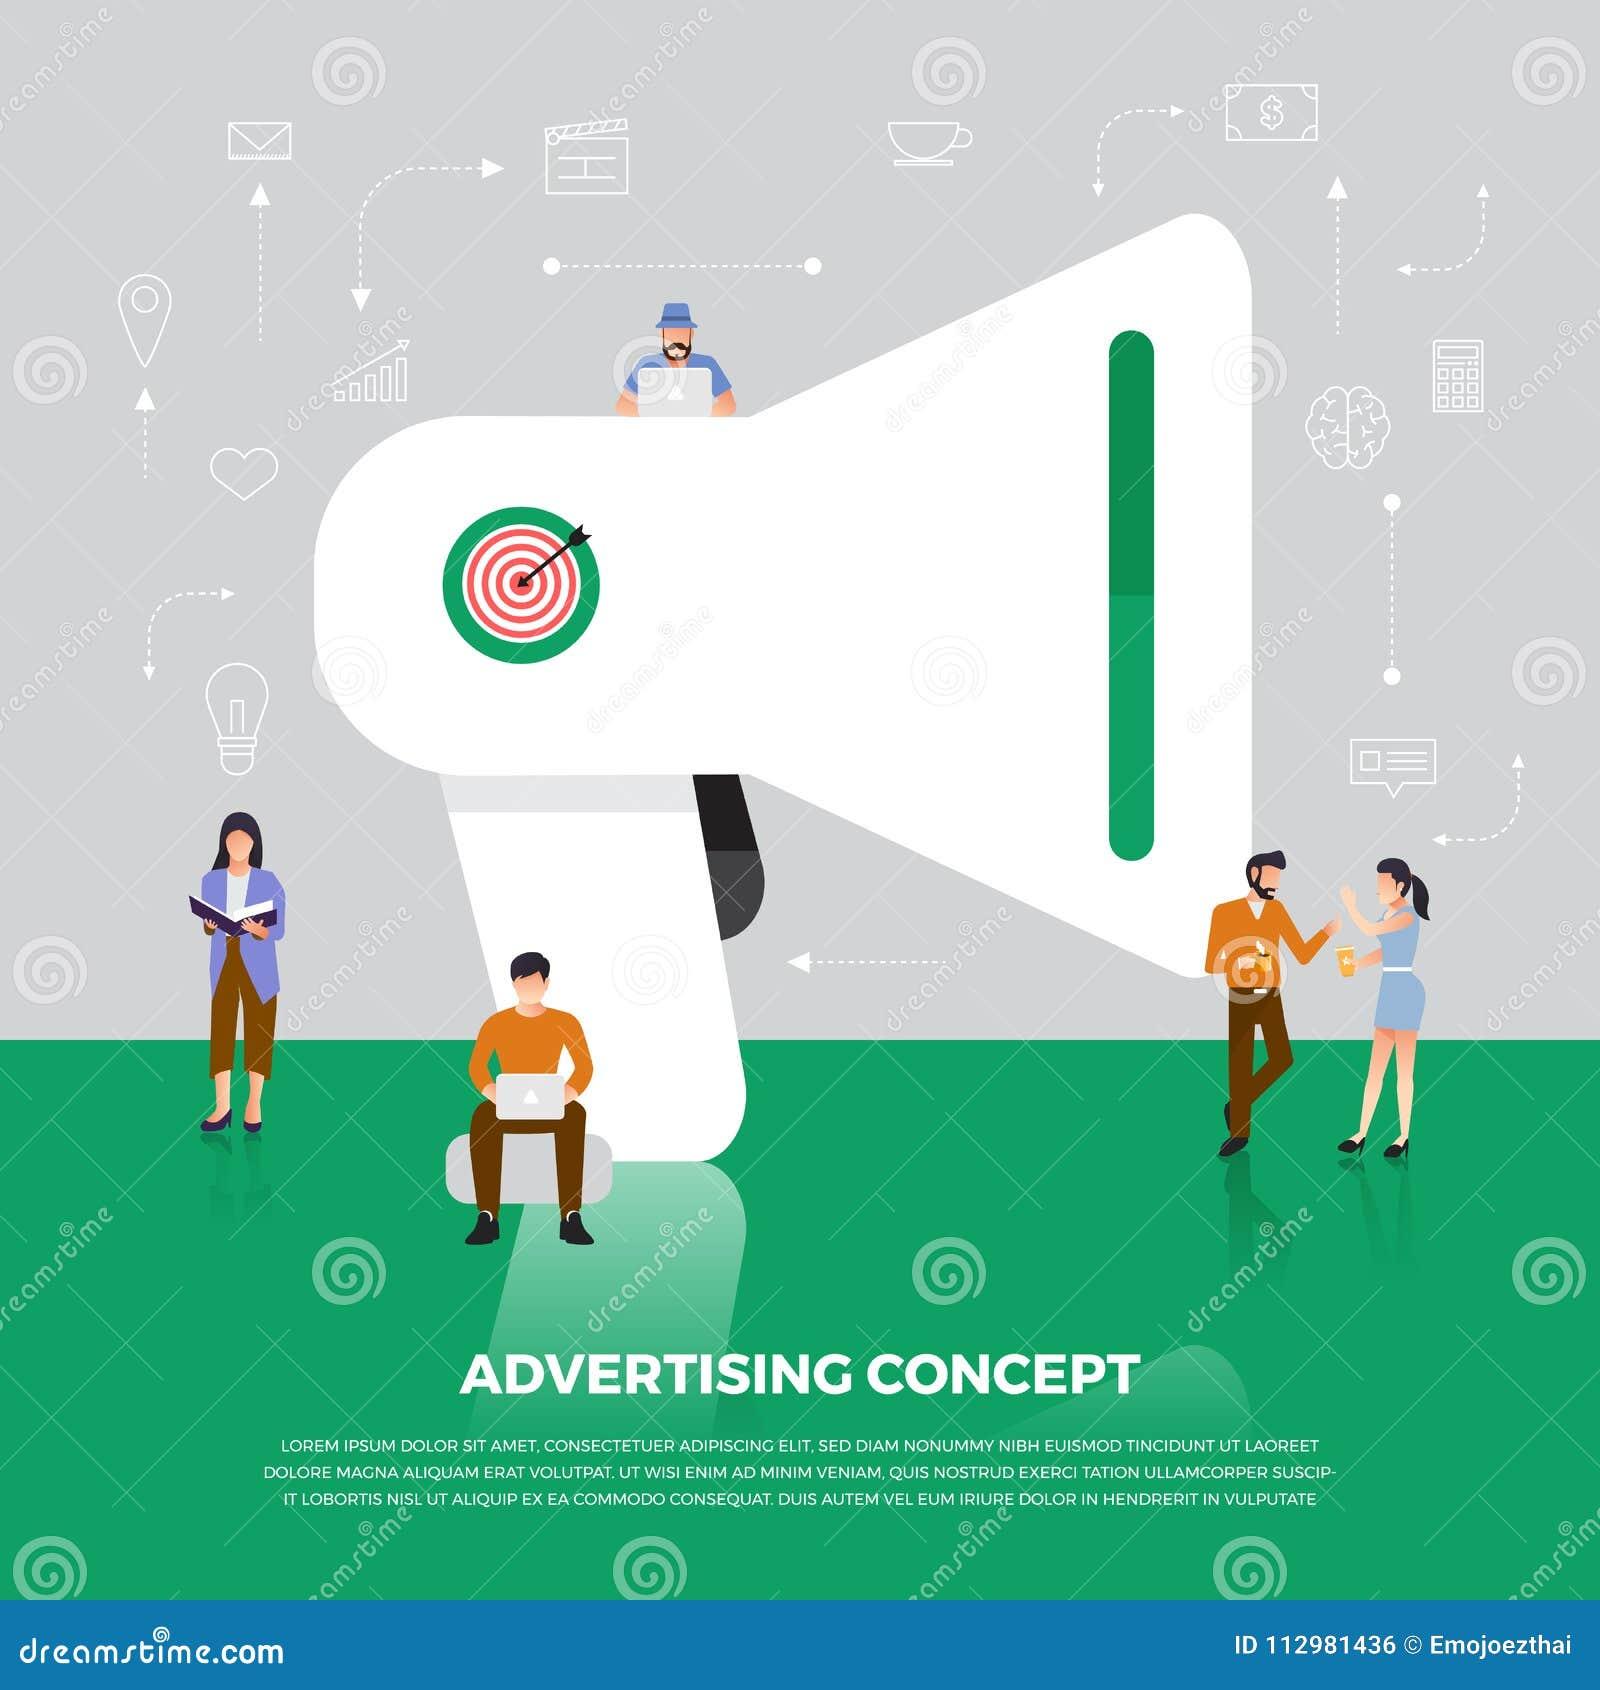 Flat design concept advertising digital marketing. Group people